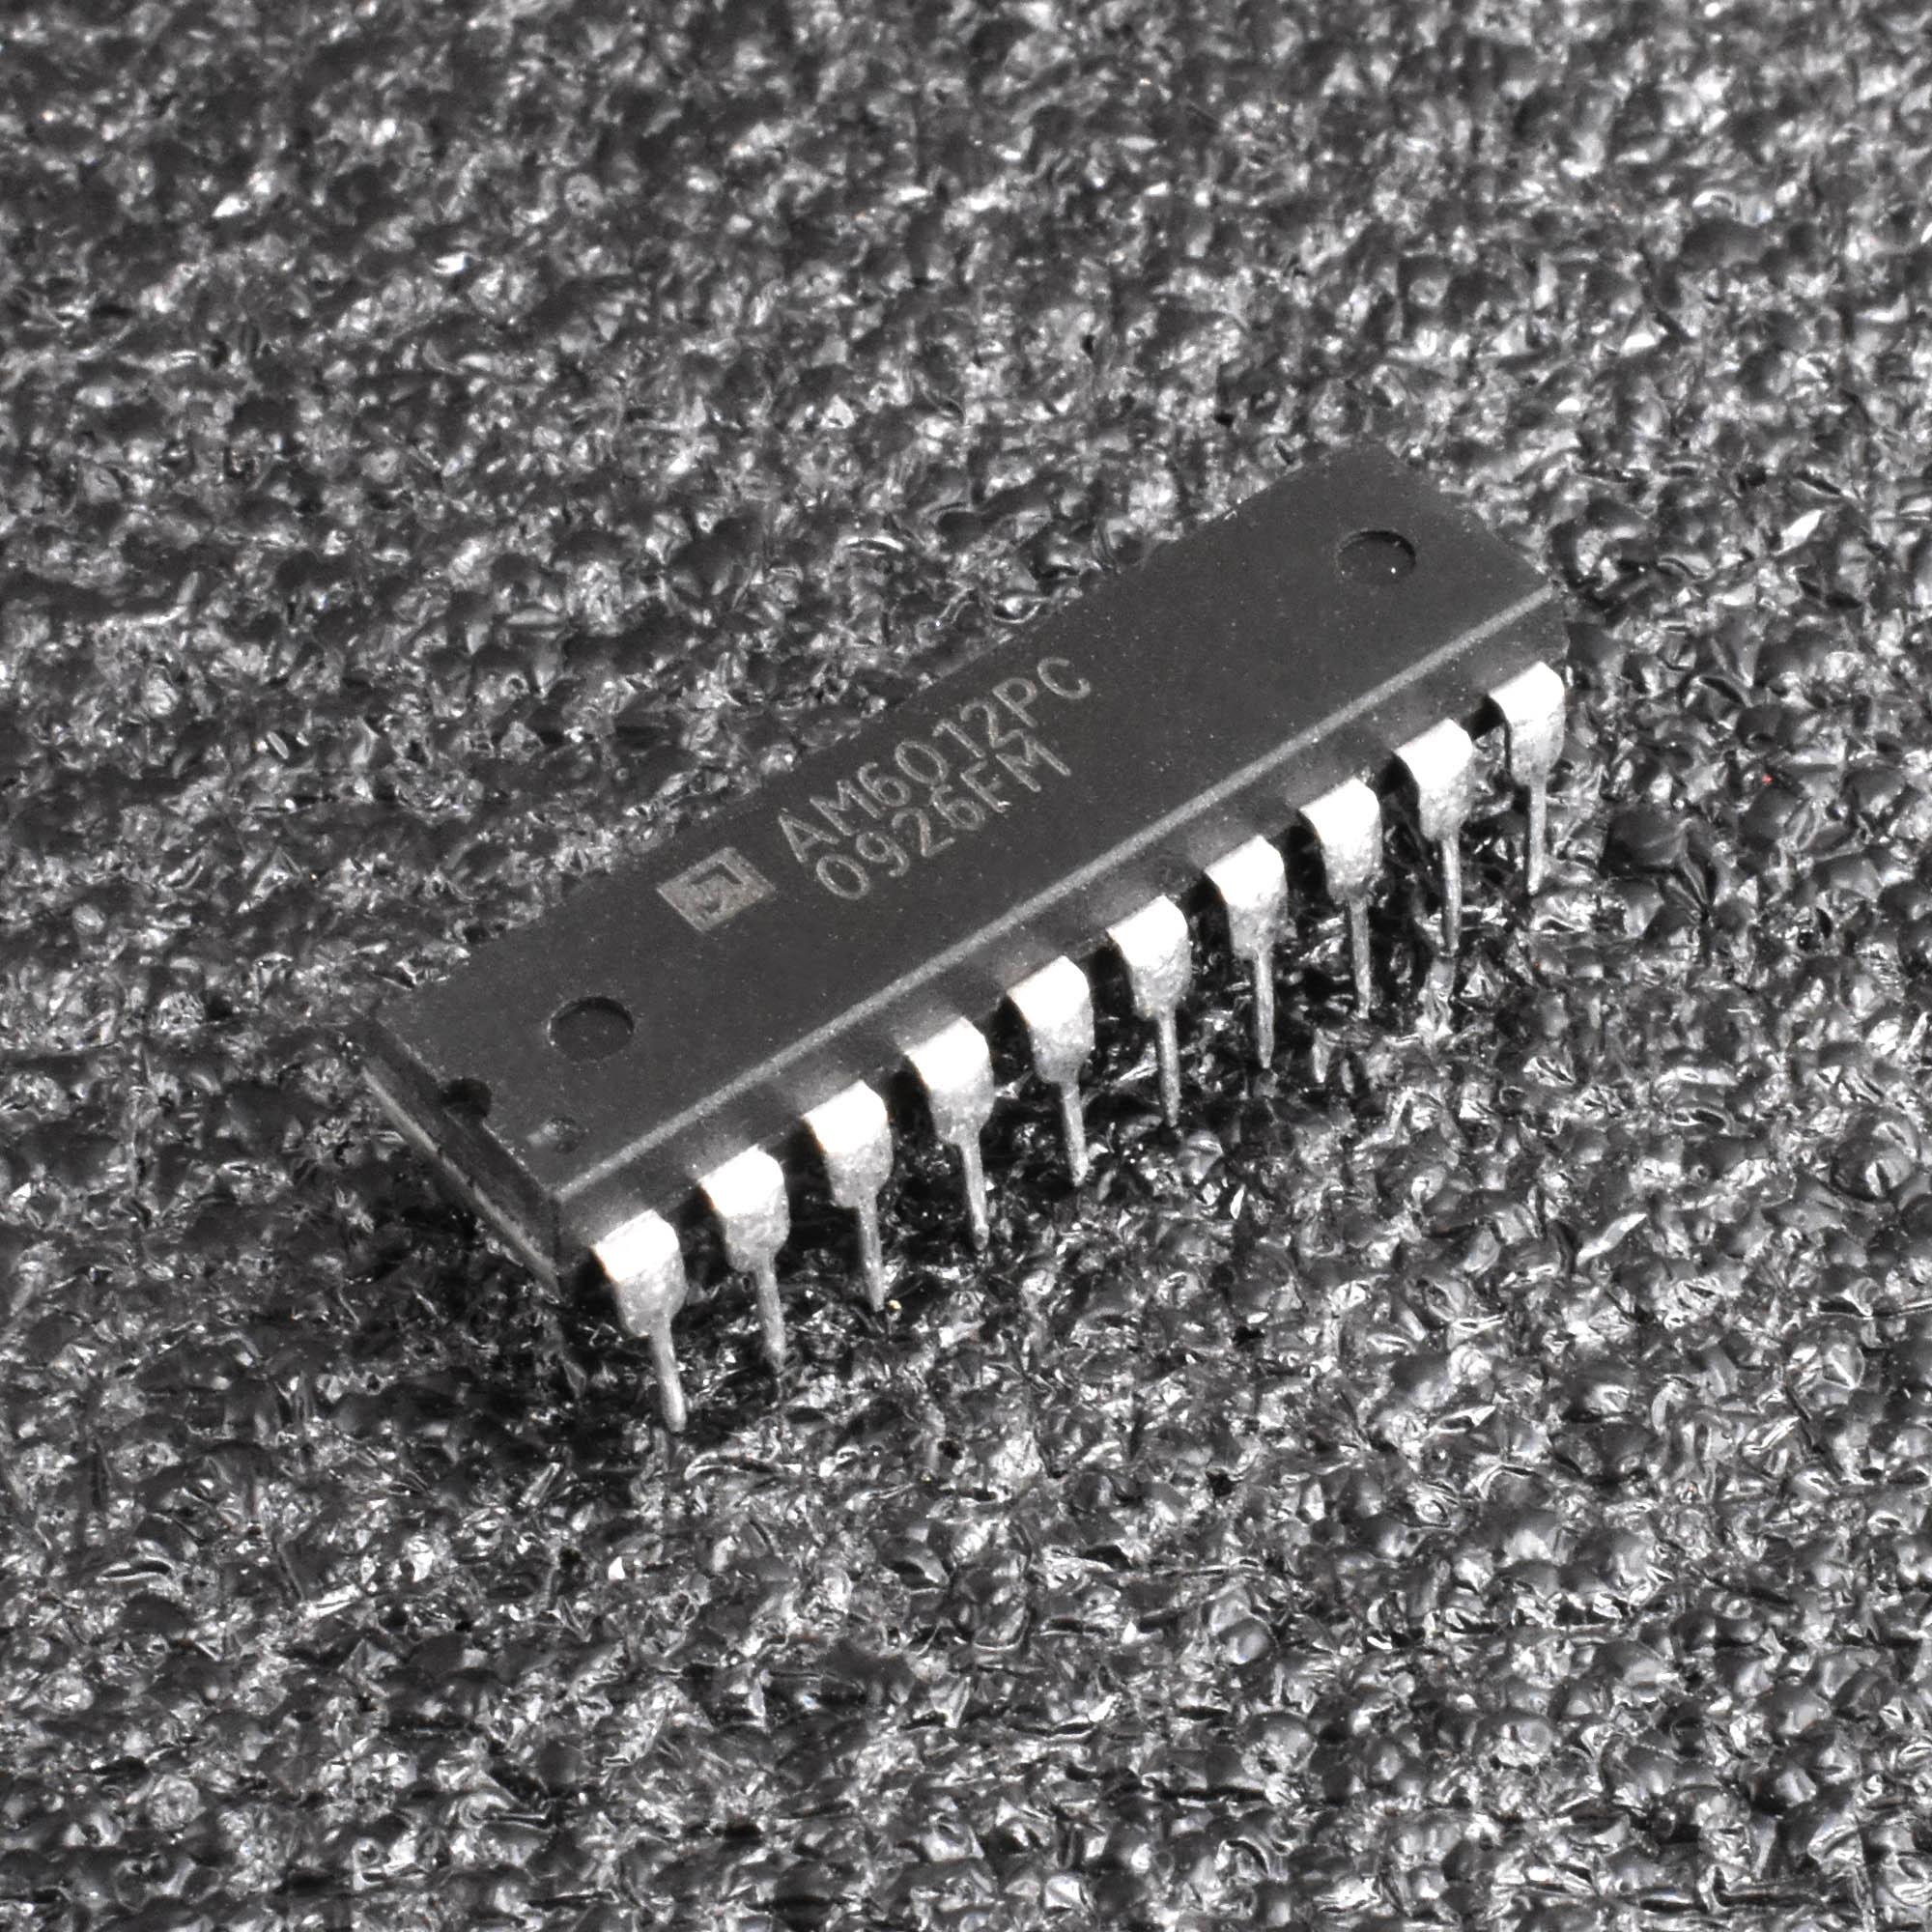 1PCS AM6012PC AM6012 DIP-20 12-Bit Digital-to-Analog Converter IC L2KD